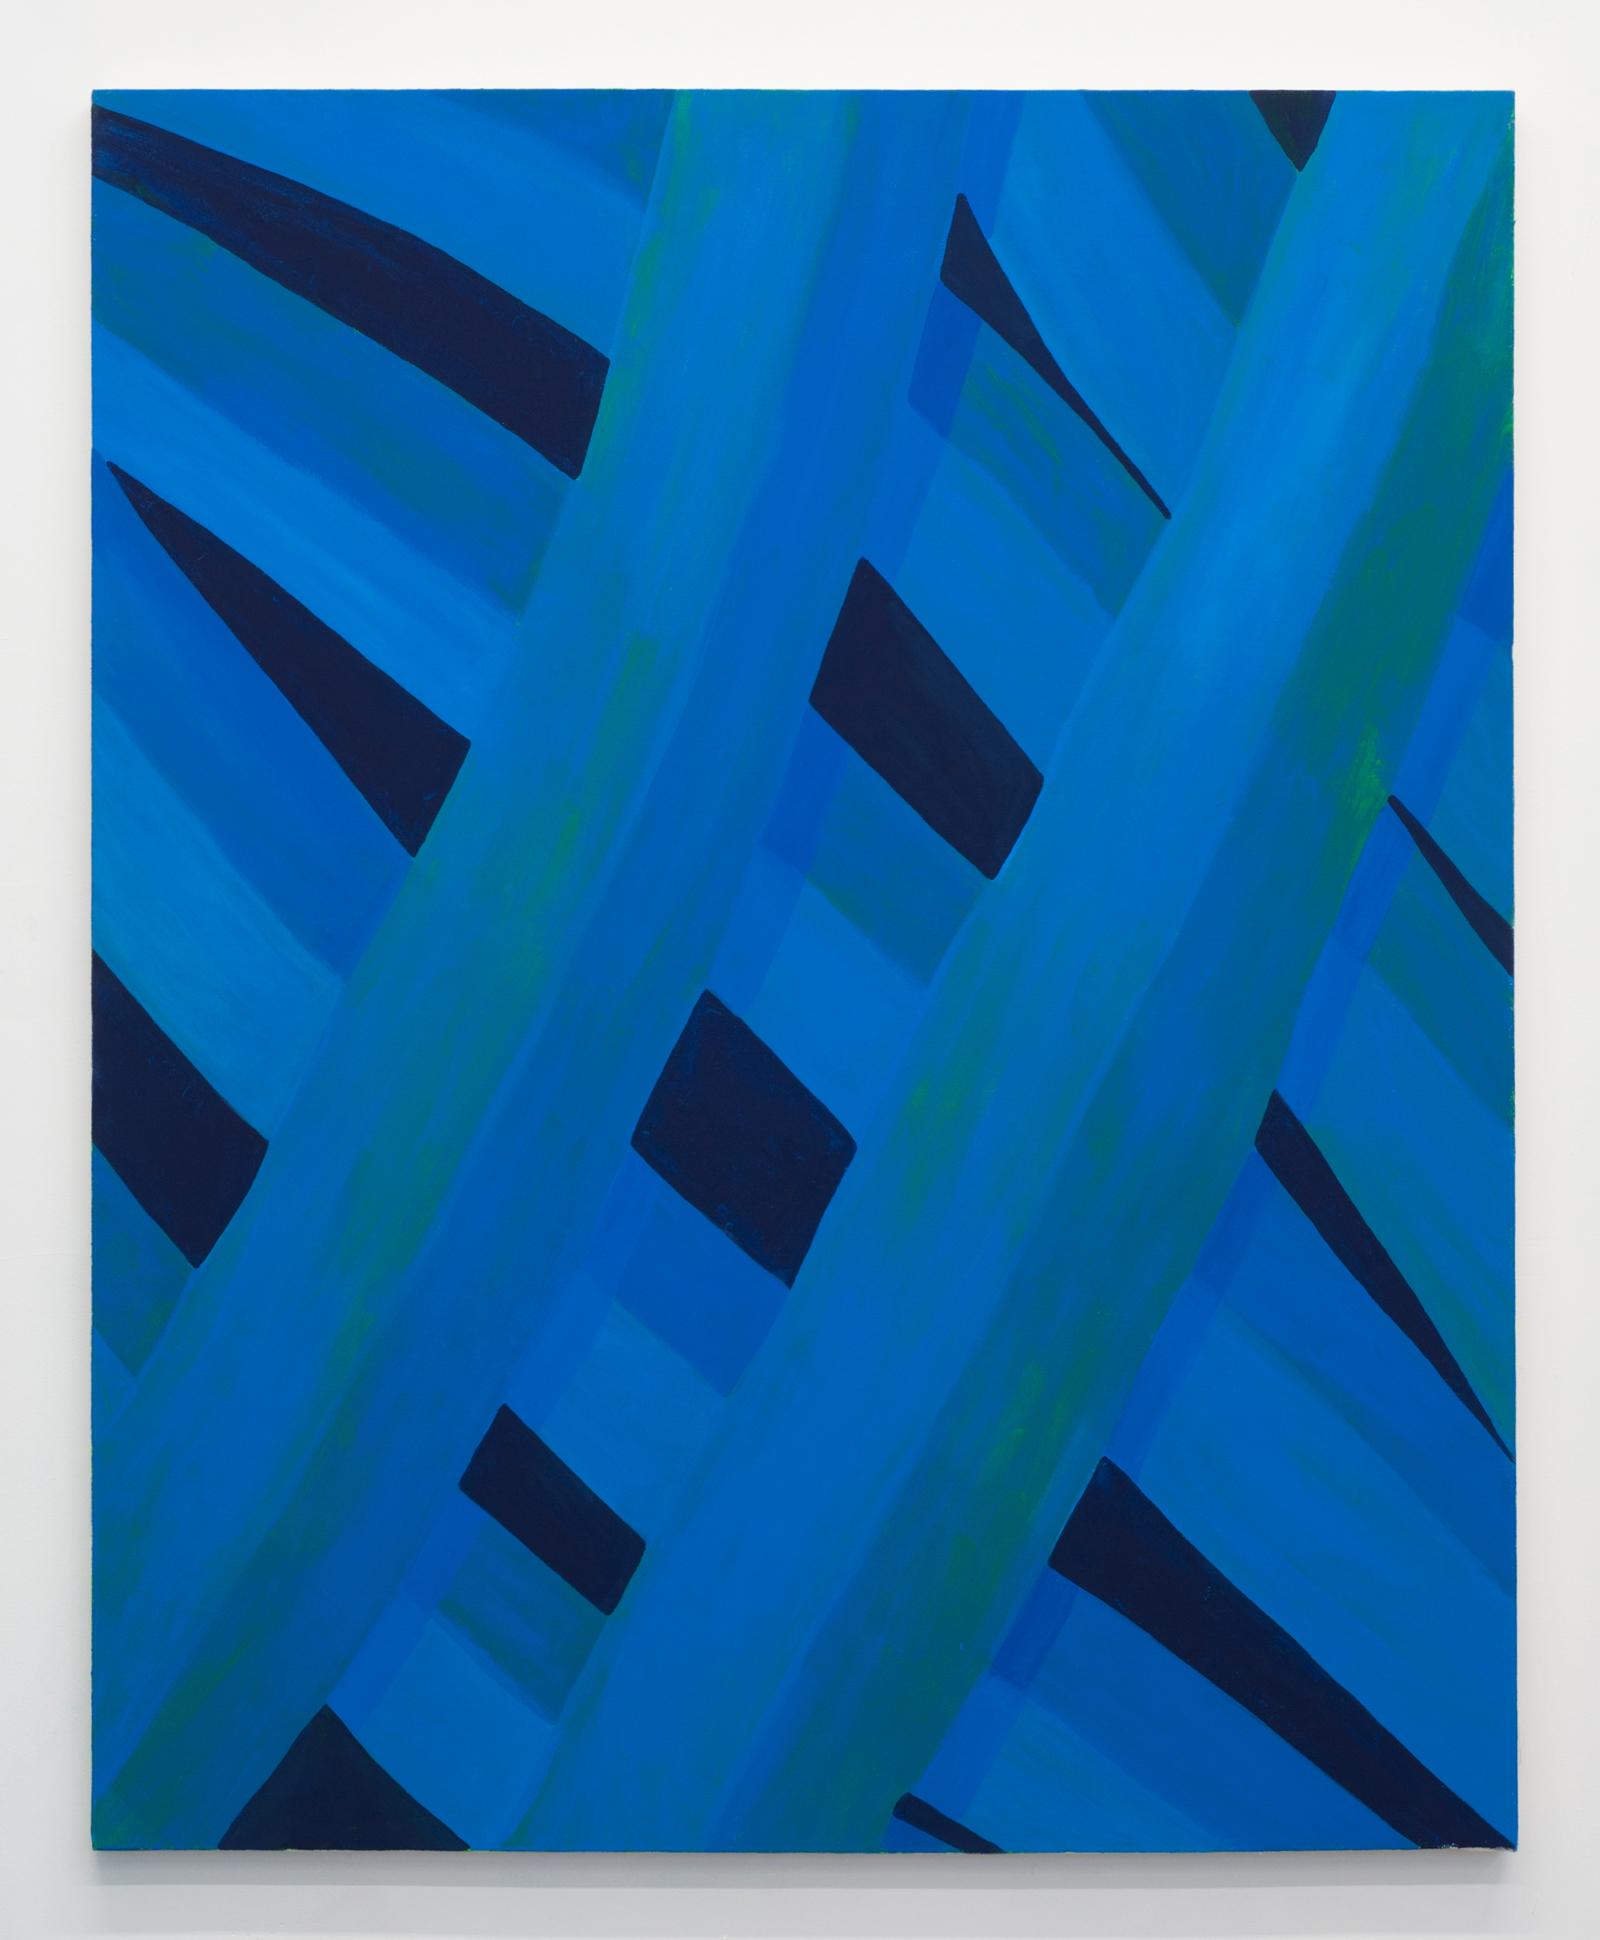 Corydon Cowansage, Grass #47, 2015, 50 x 40 inches, acrylic on canvas